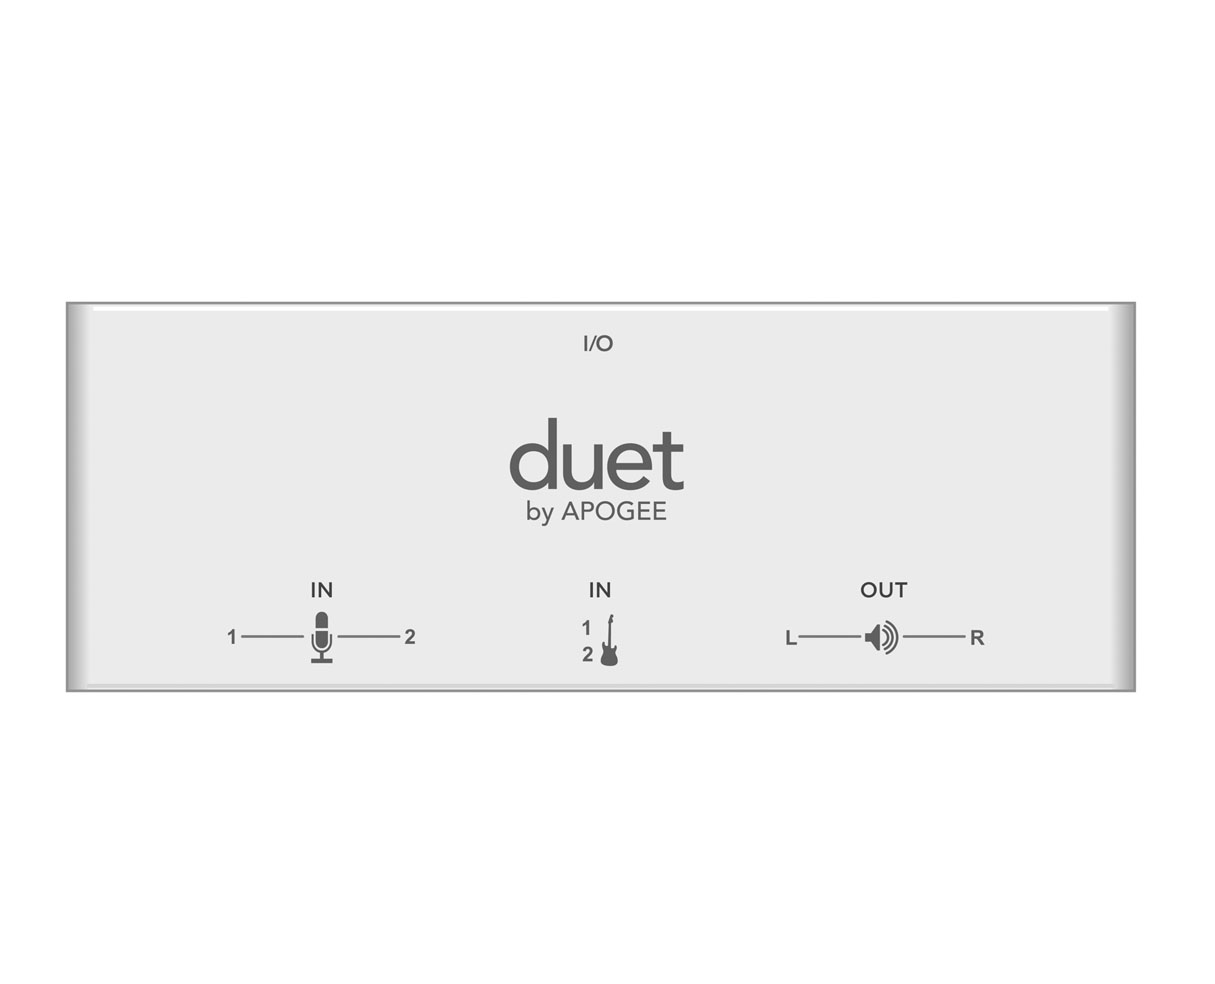 apogee duet 2 breakout box accessory for duet proaudiostar ebay. Black Bedroom Furniture Sets. Home Design Ideas